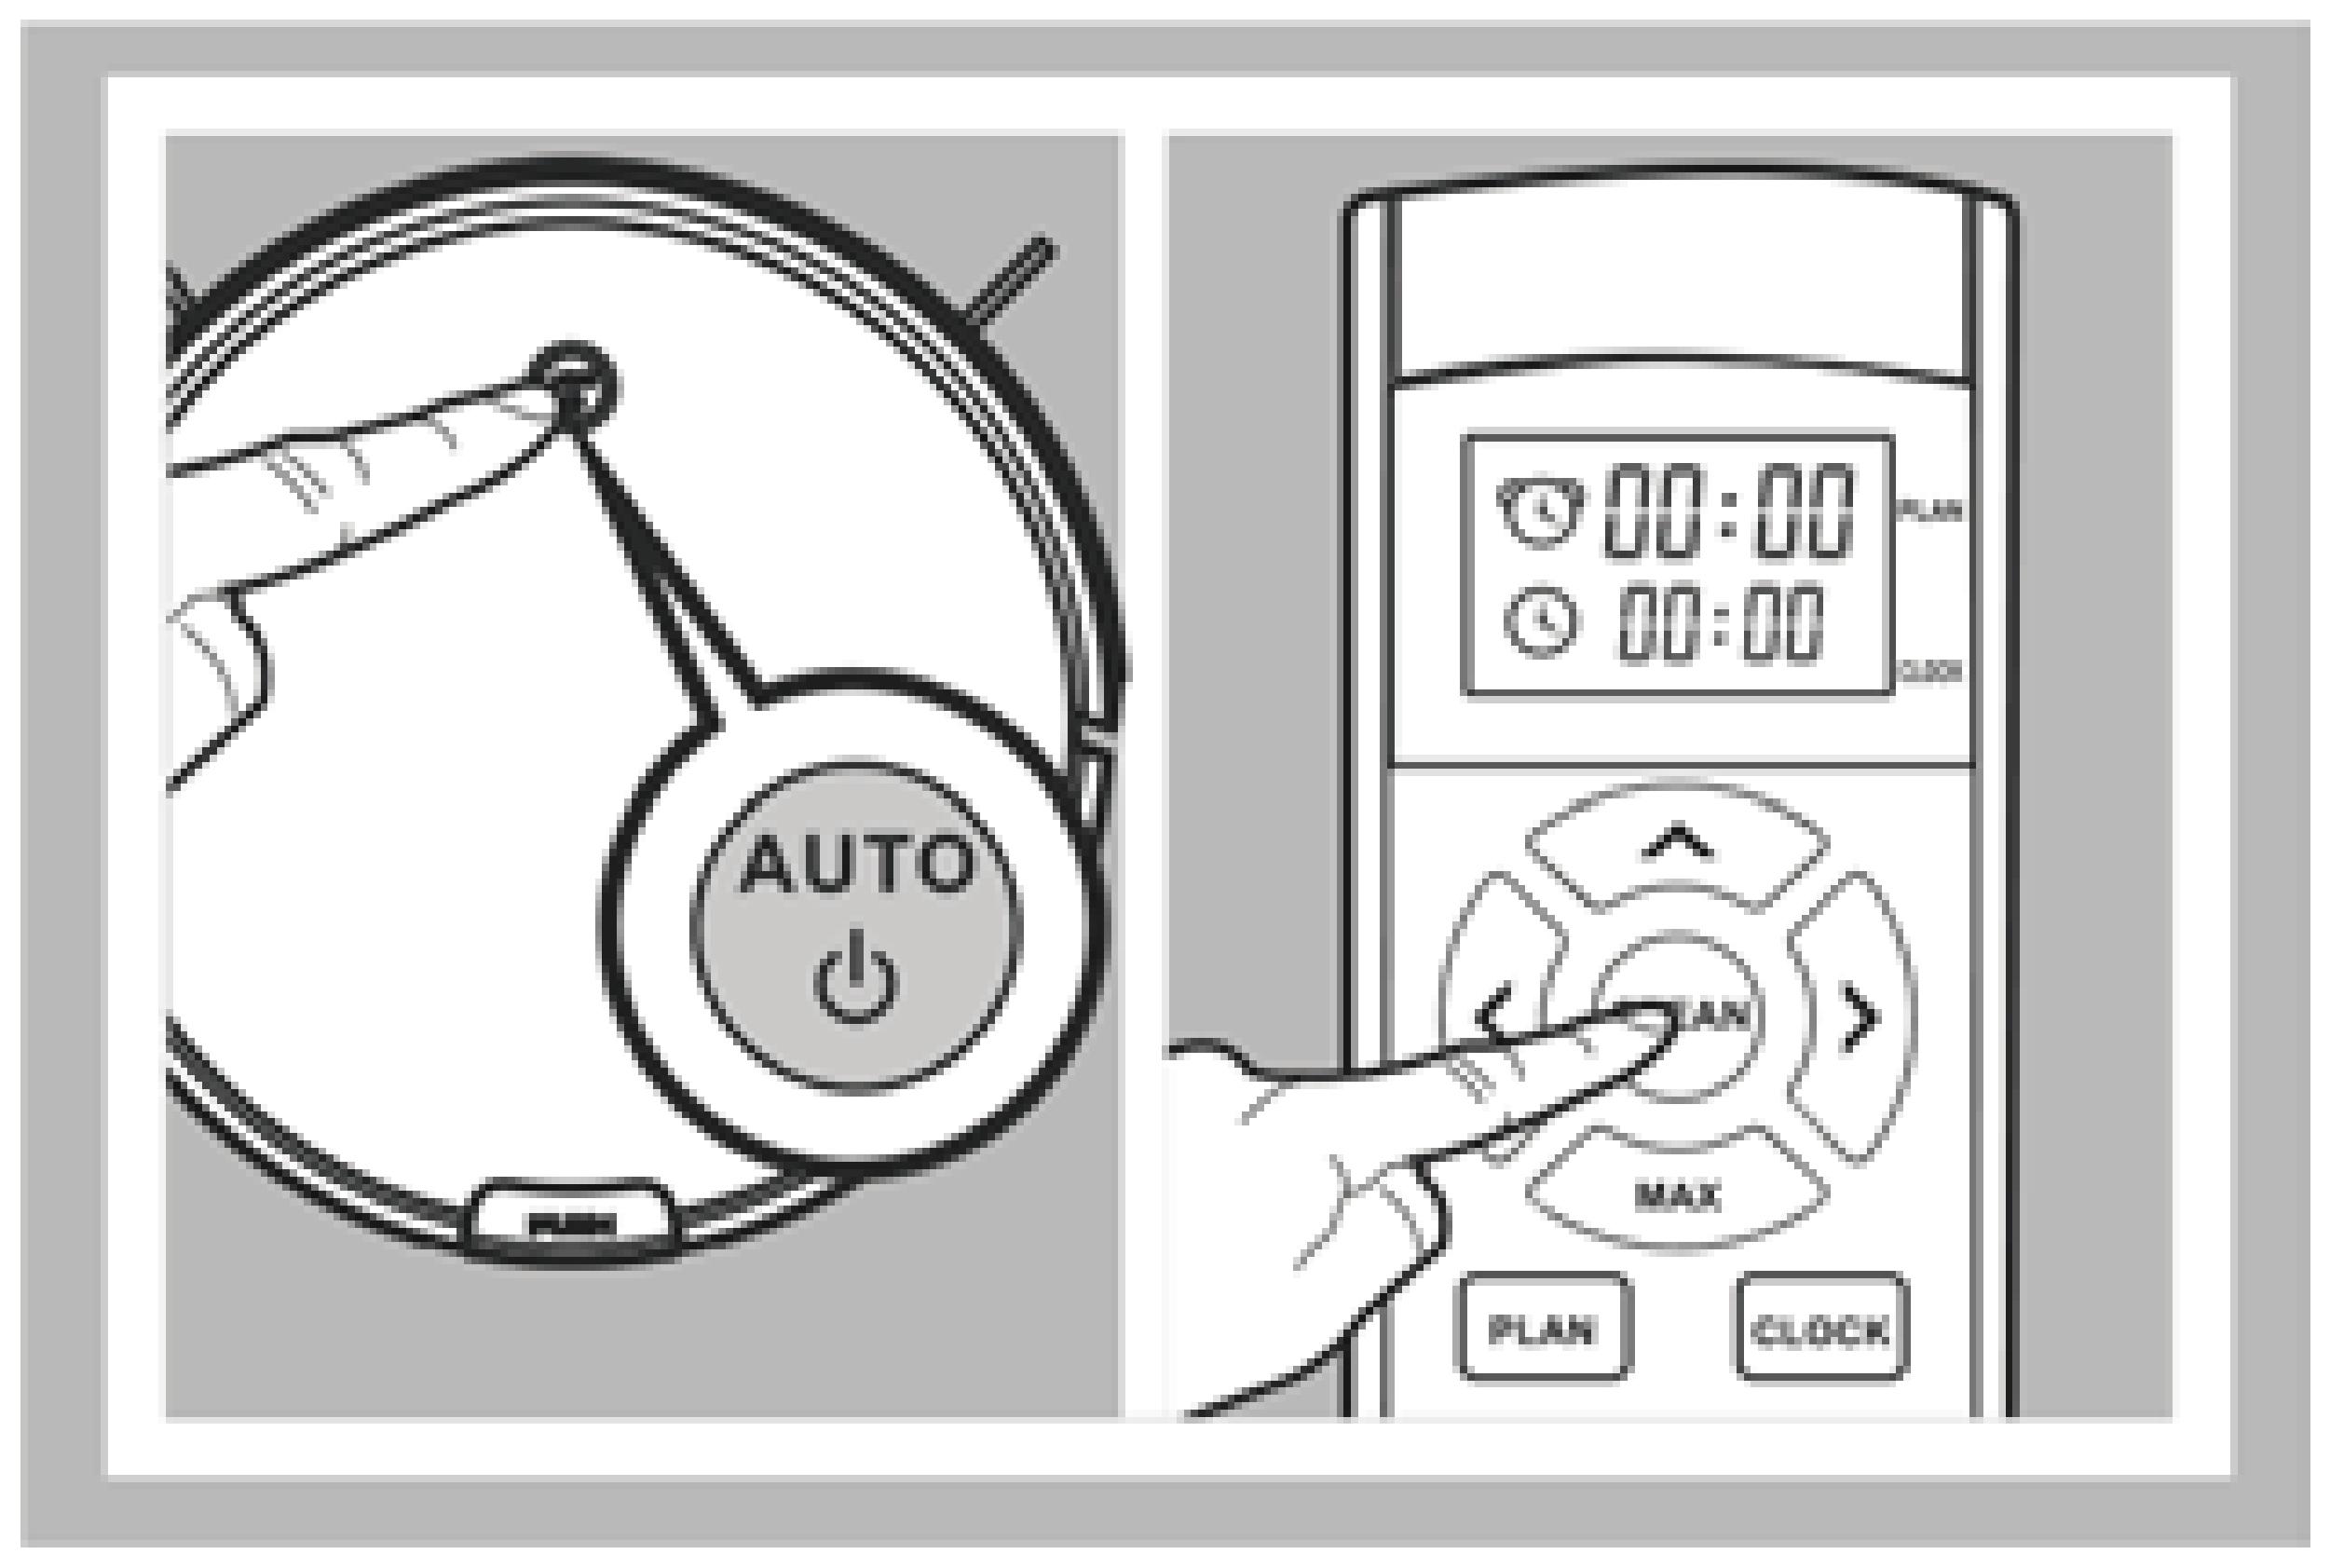 Robô Aspirador de Pó JETS J1 - Limpeza automática ou ziguezague